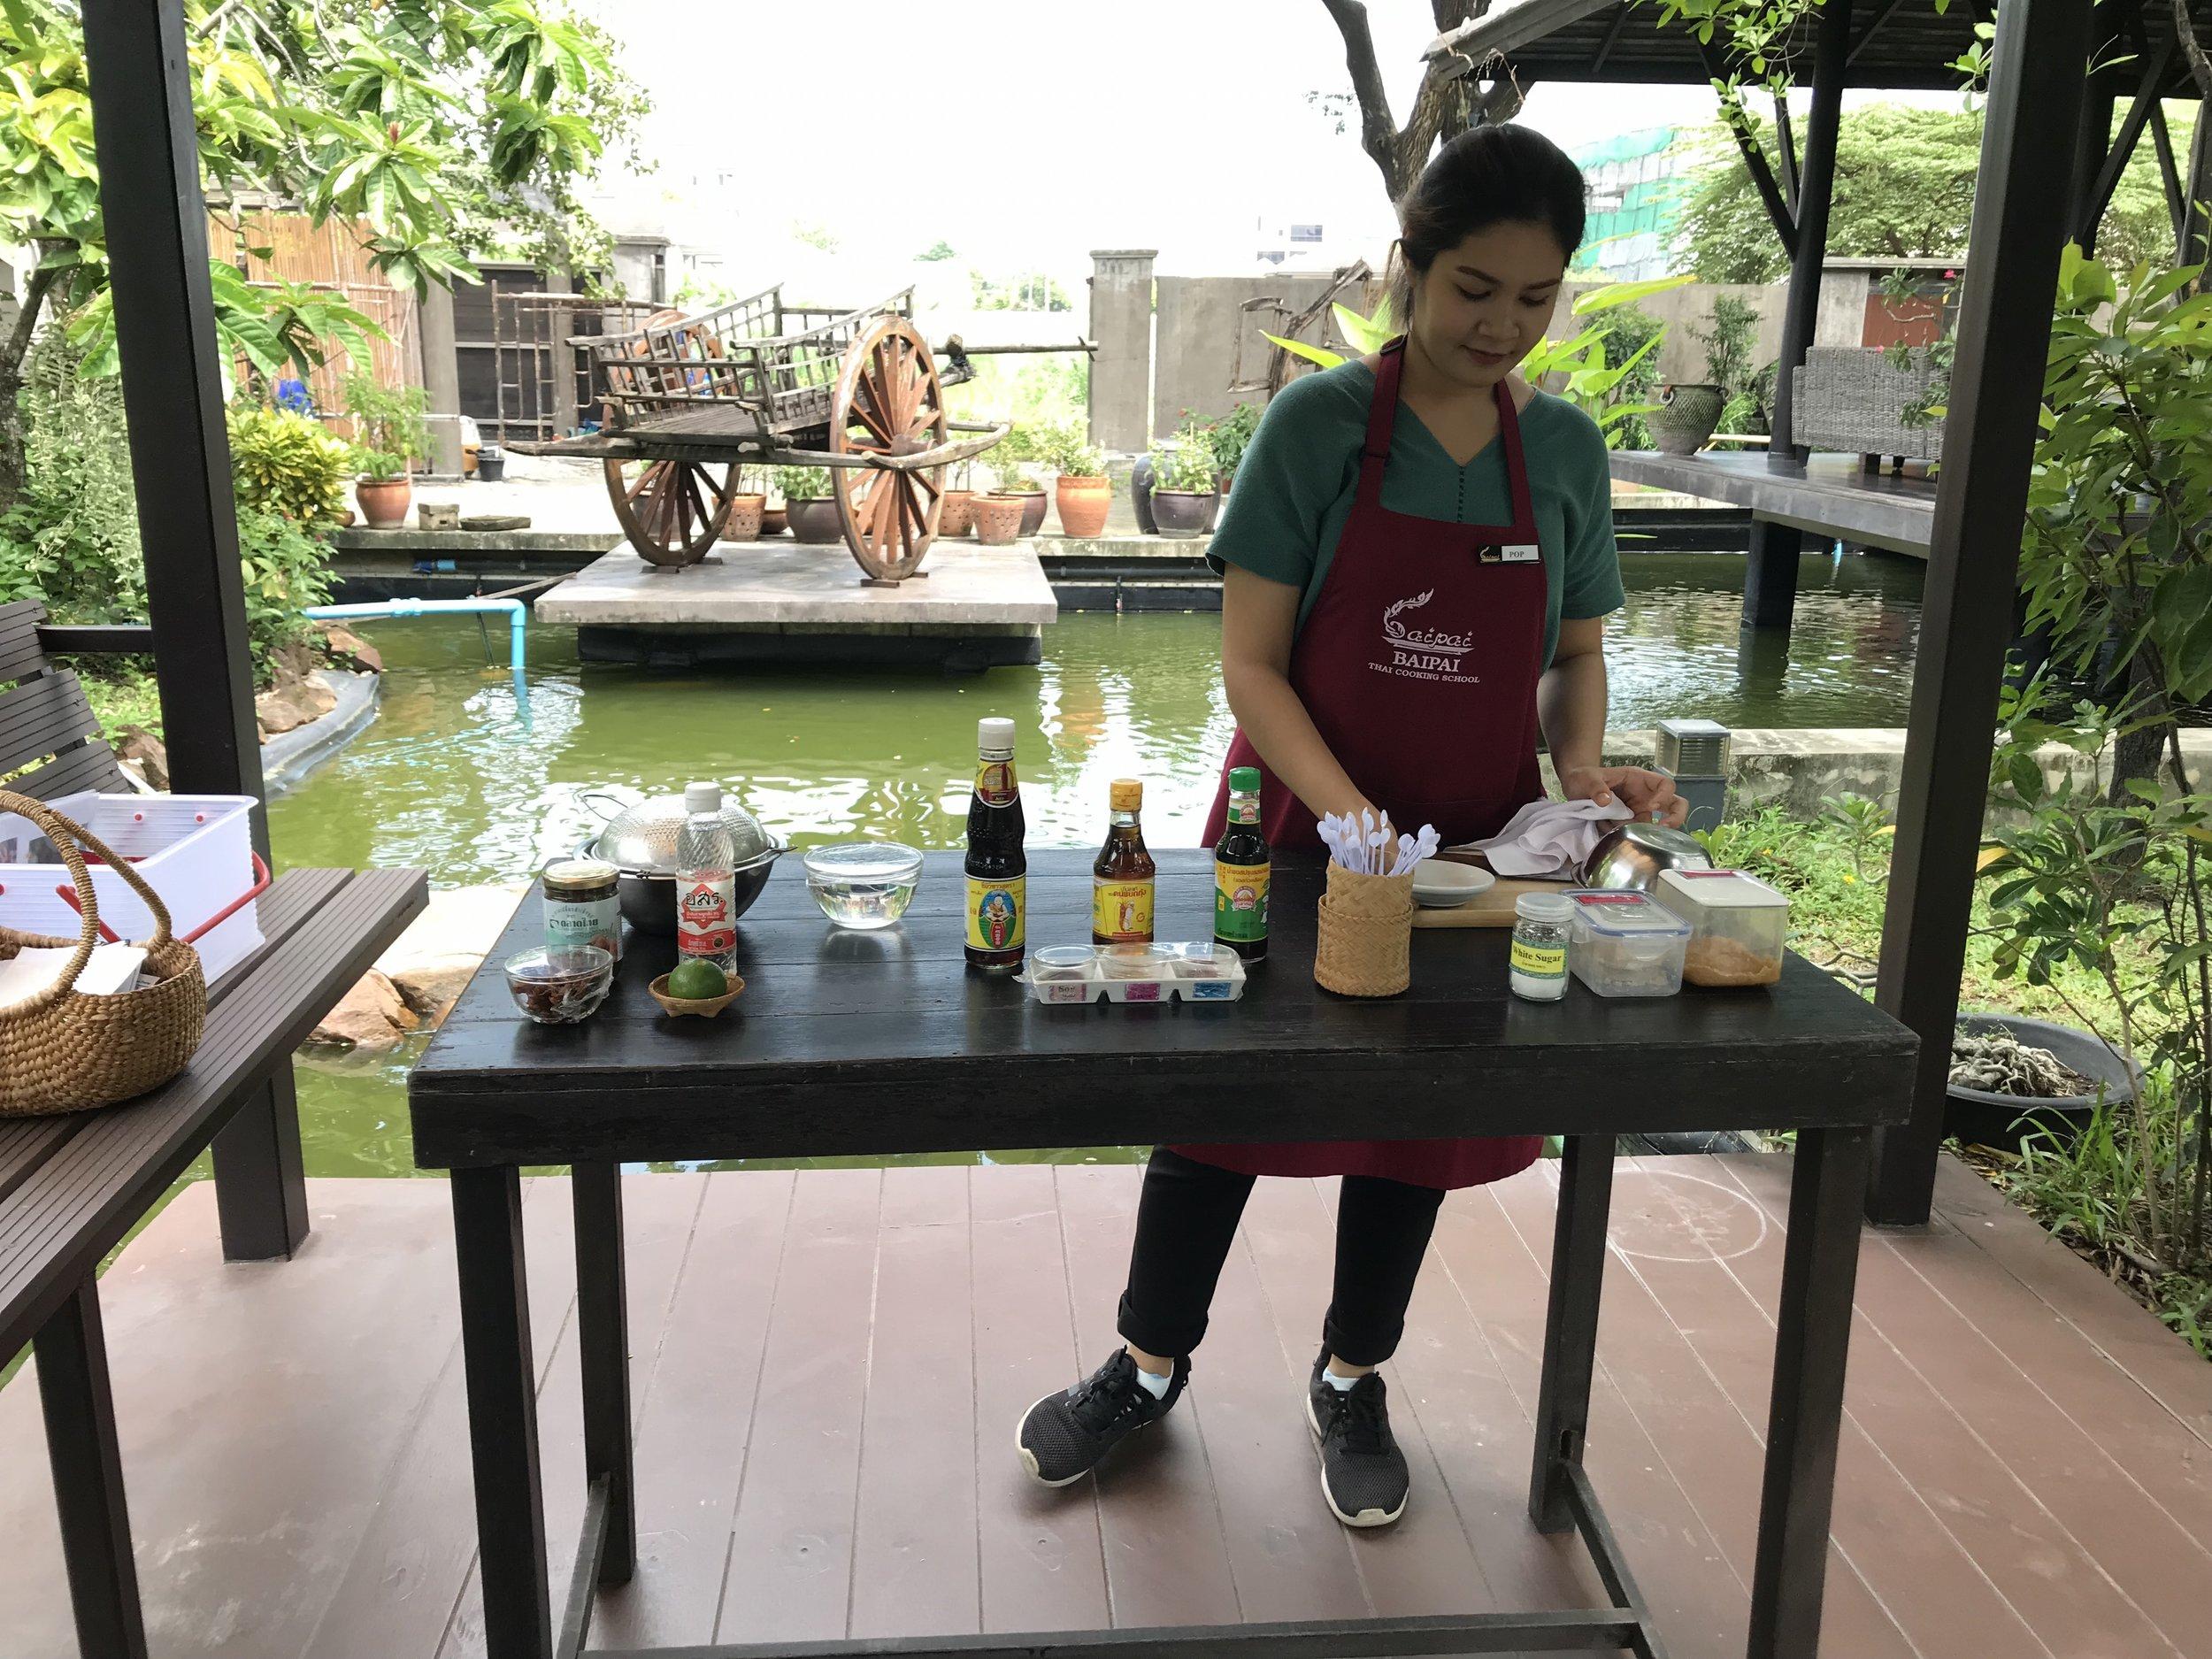 baipai school-cooking-class-demostrate-02.JPG